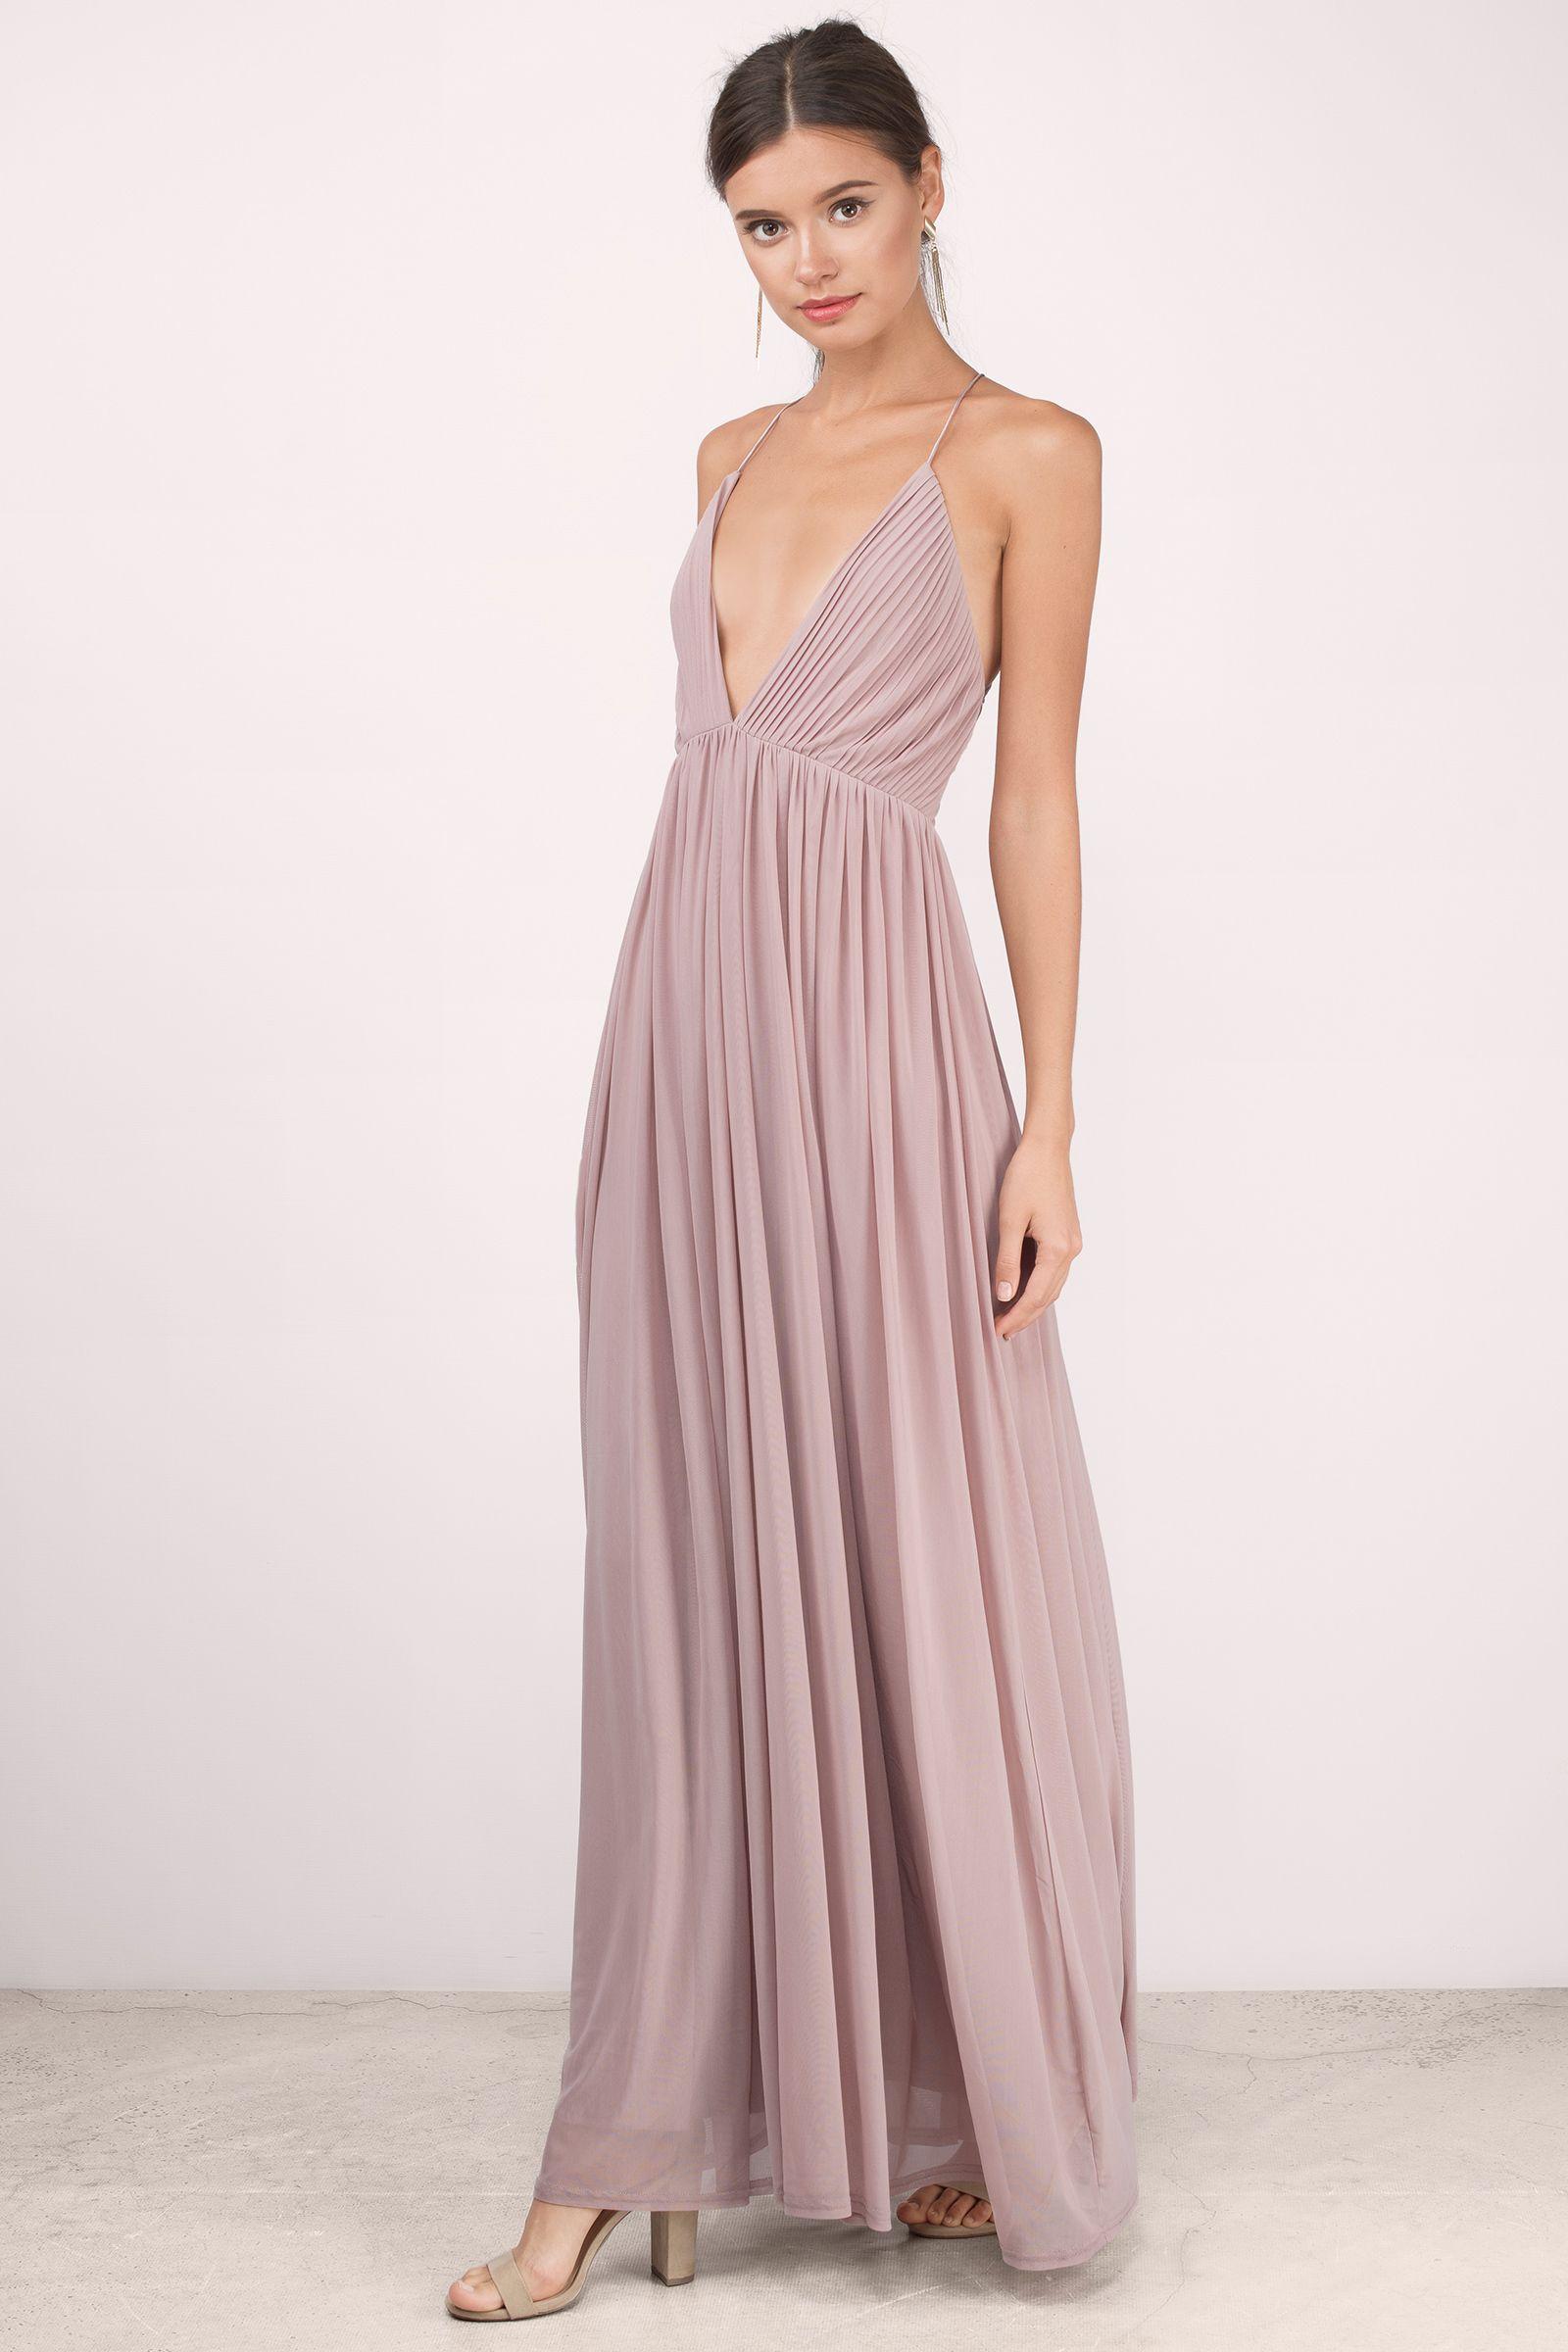 28+ Plunging maxi dress ideas